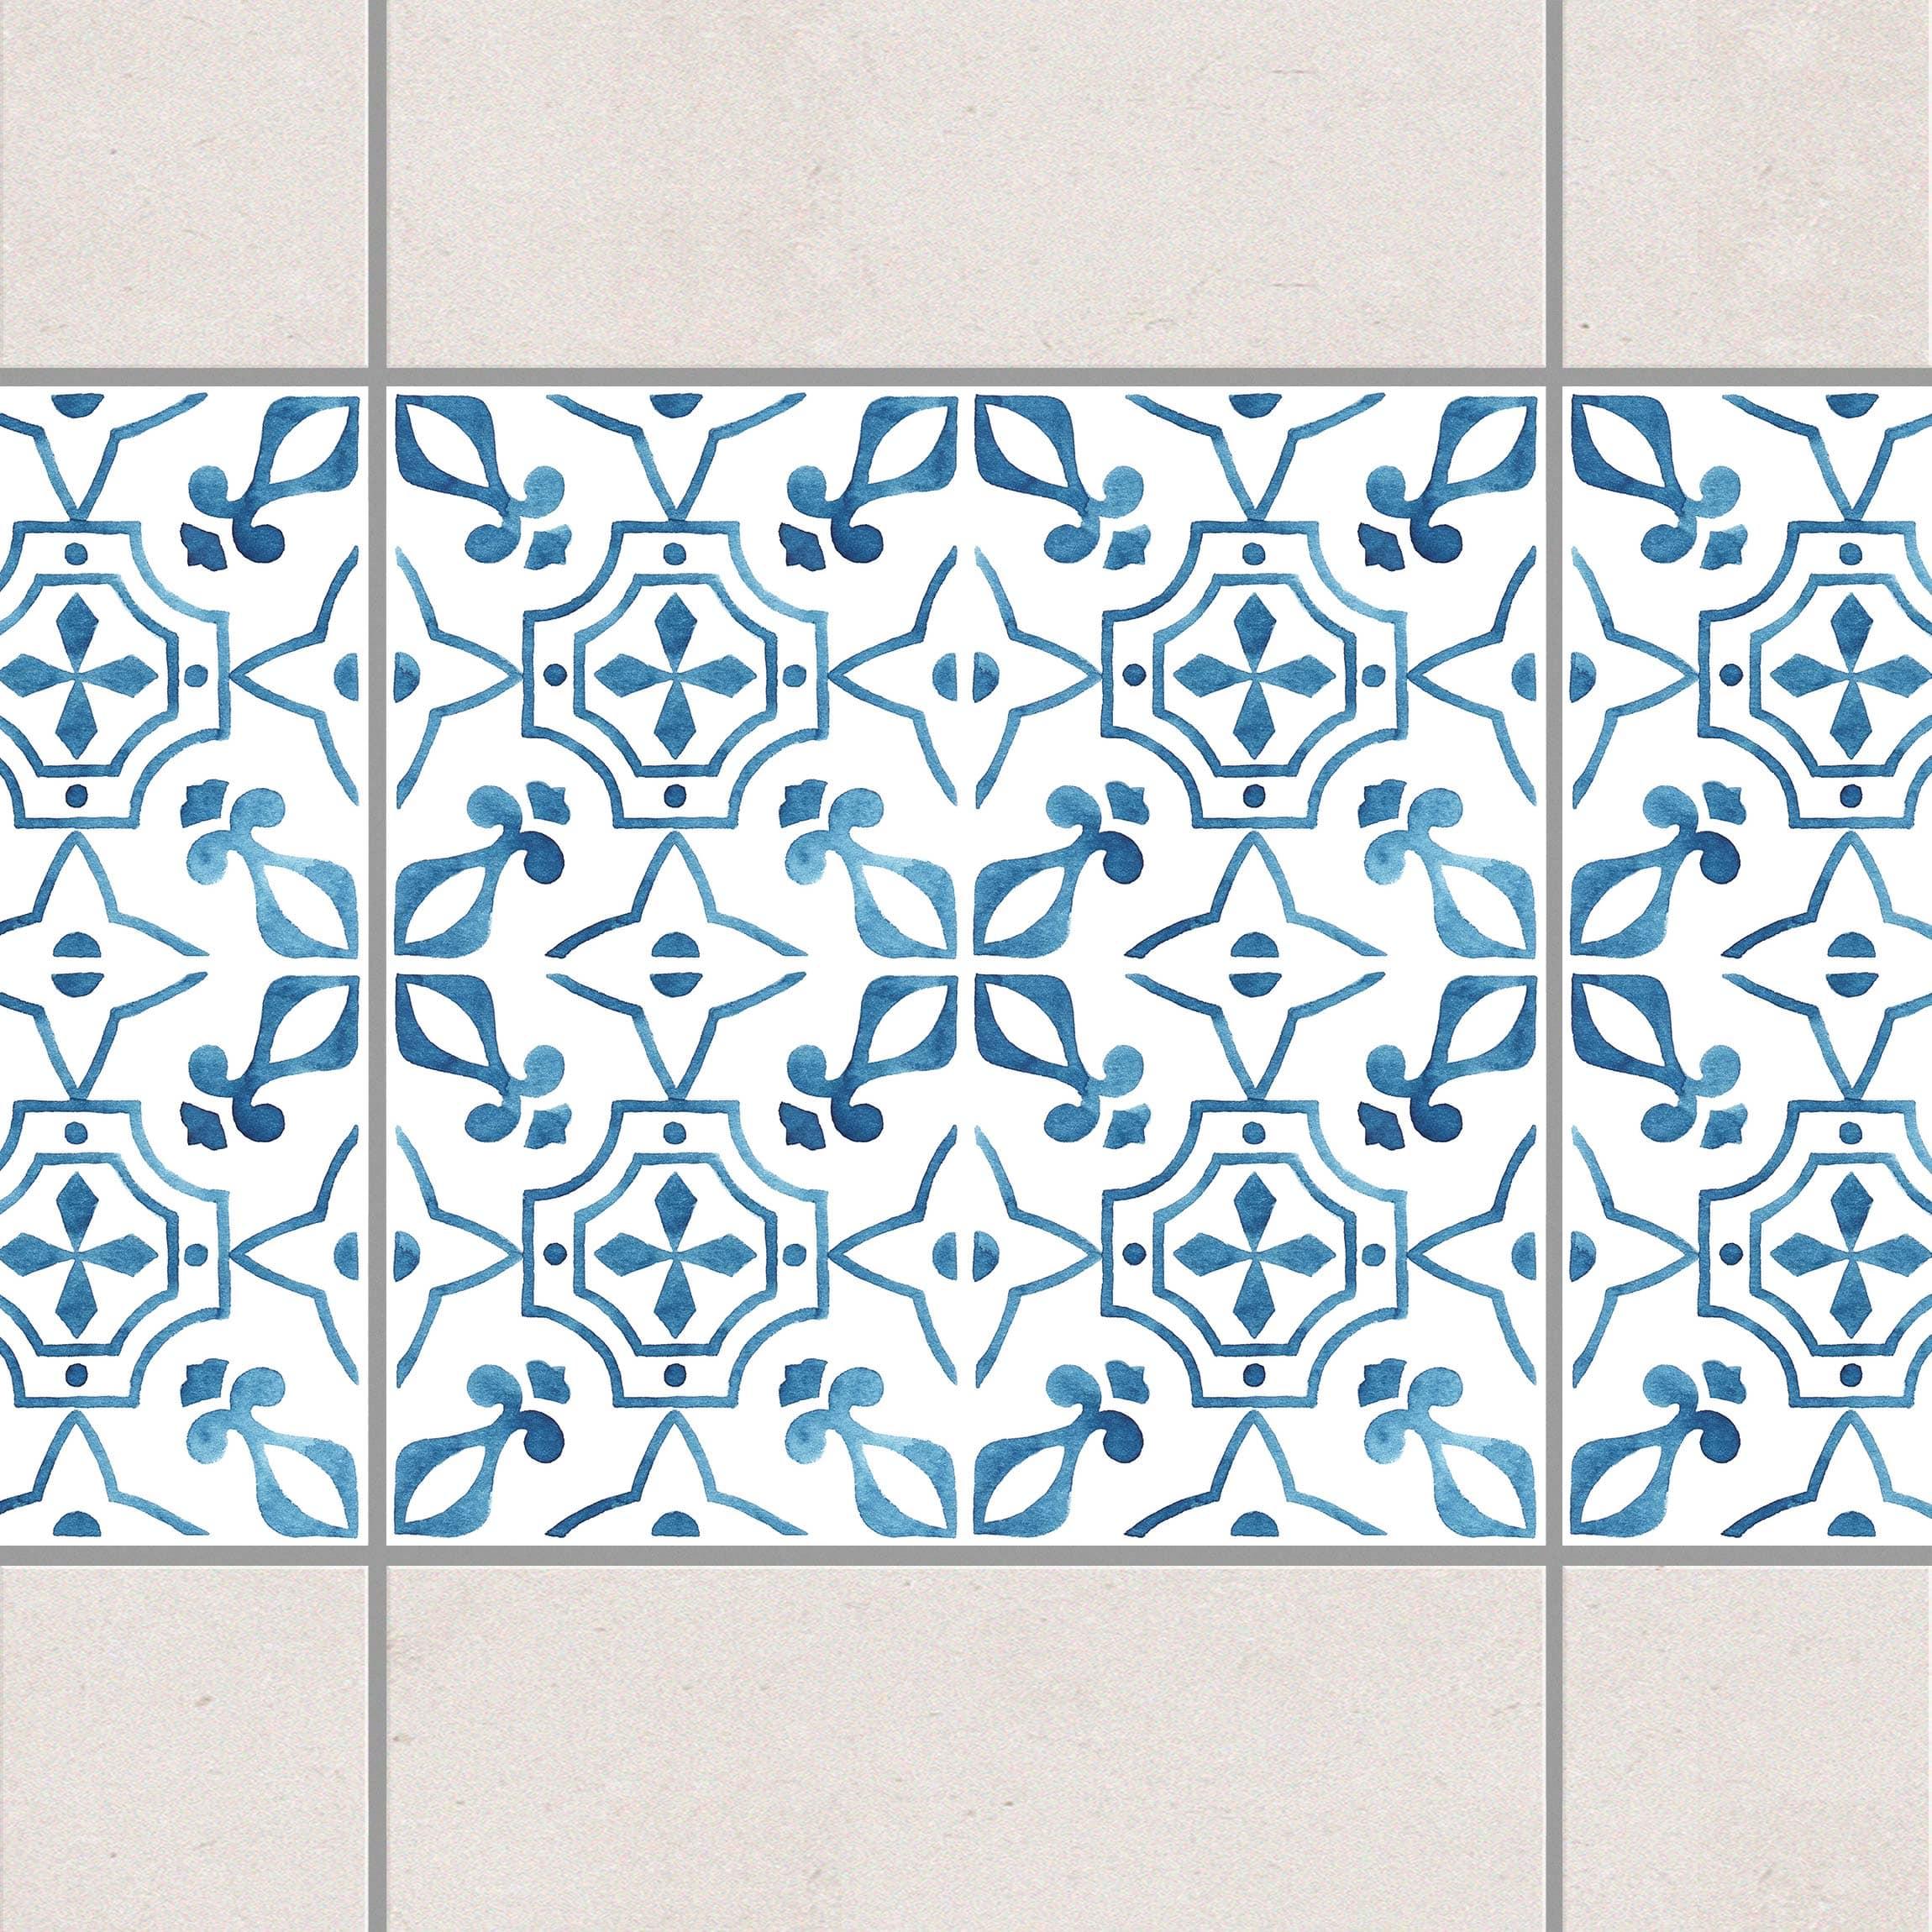 fliesen bord re blau wei muster serie no 9 1 1 quadrat 15cm x 15cm fliesenaufkleber. Black Bedroom Furniture Sets. Home Design Ideas